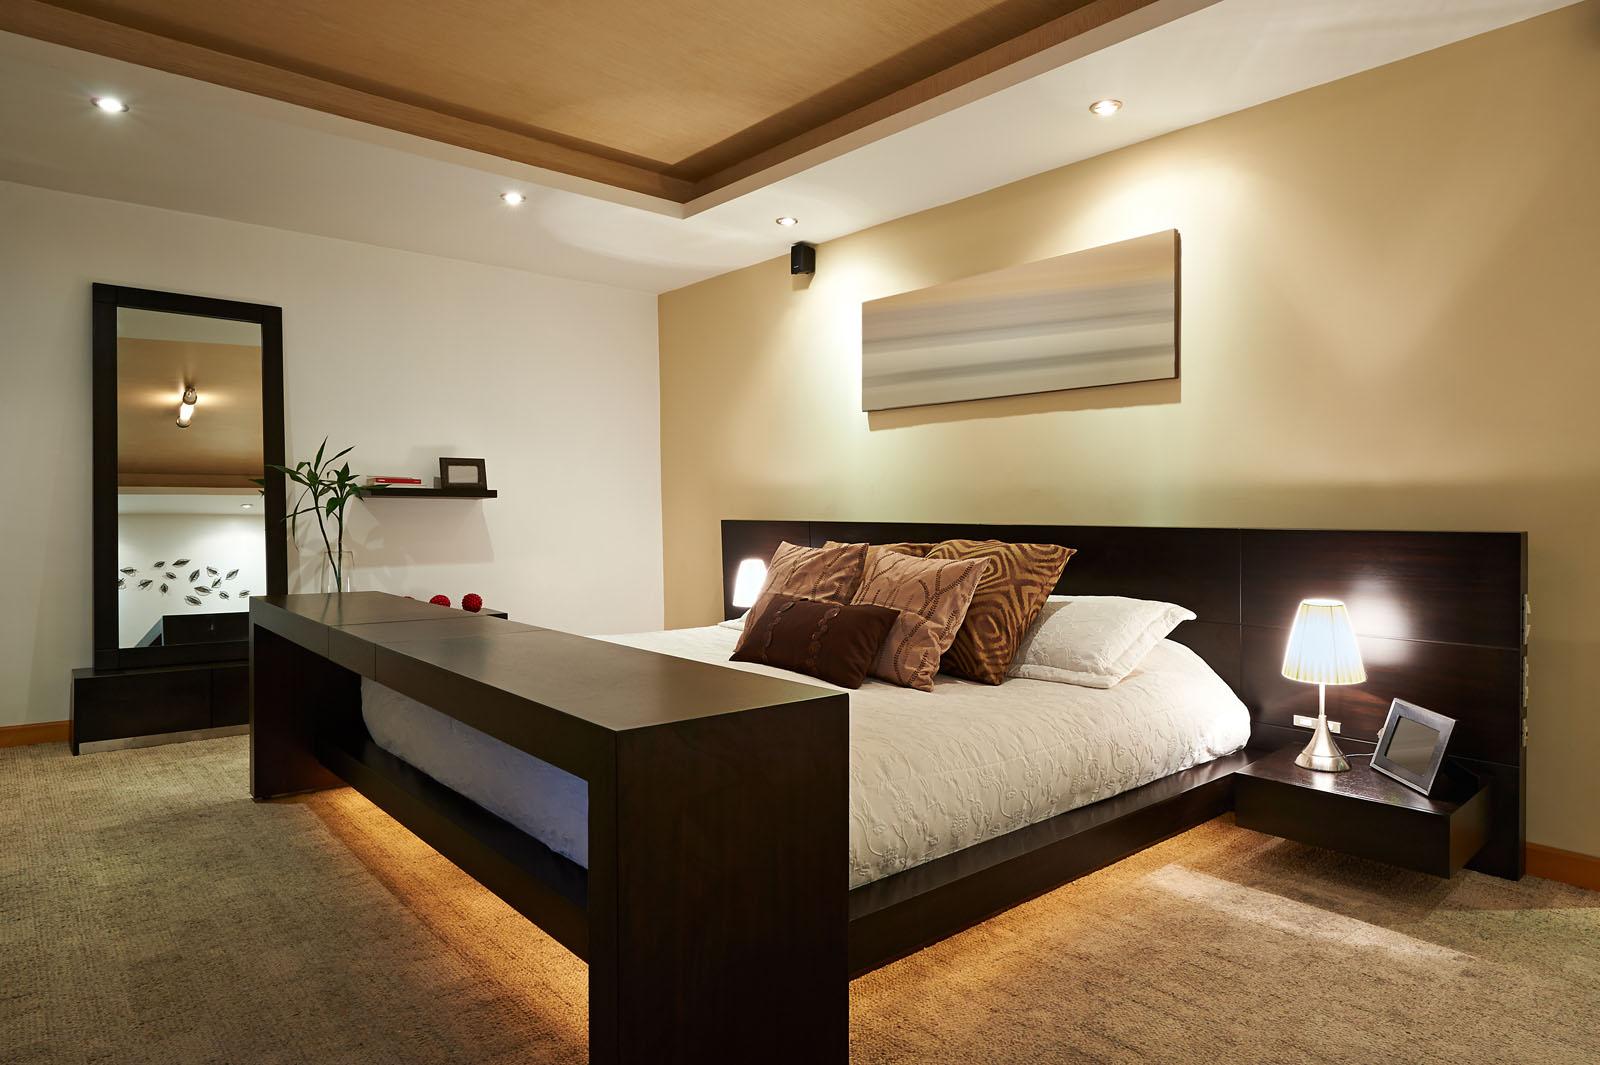 Artitalia Hospitality Restaurant Projects Hotel Furniture # Muebles Furniture